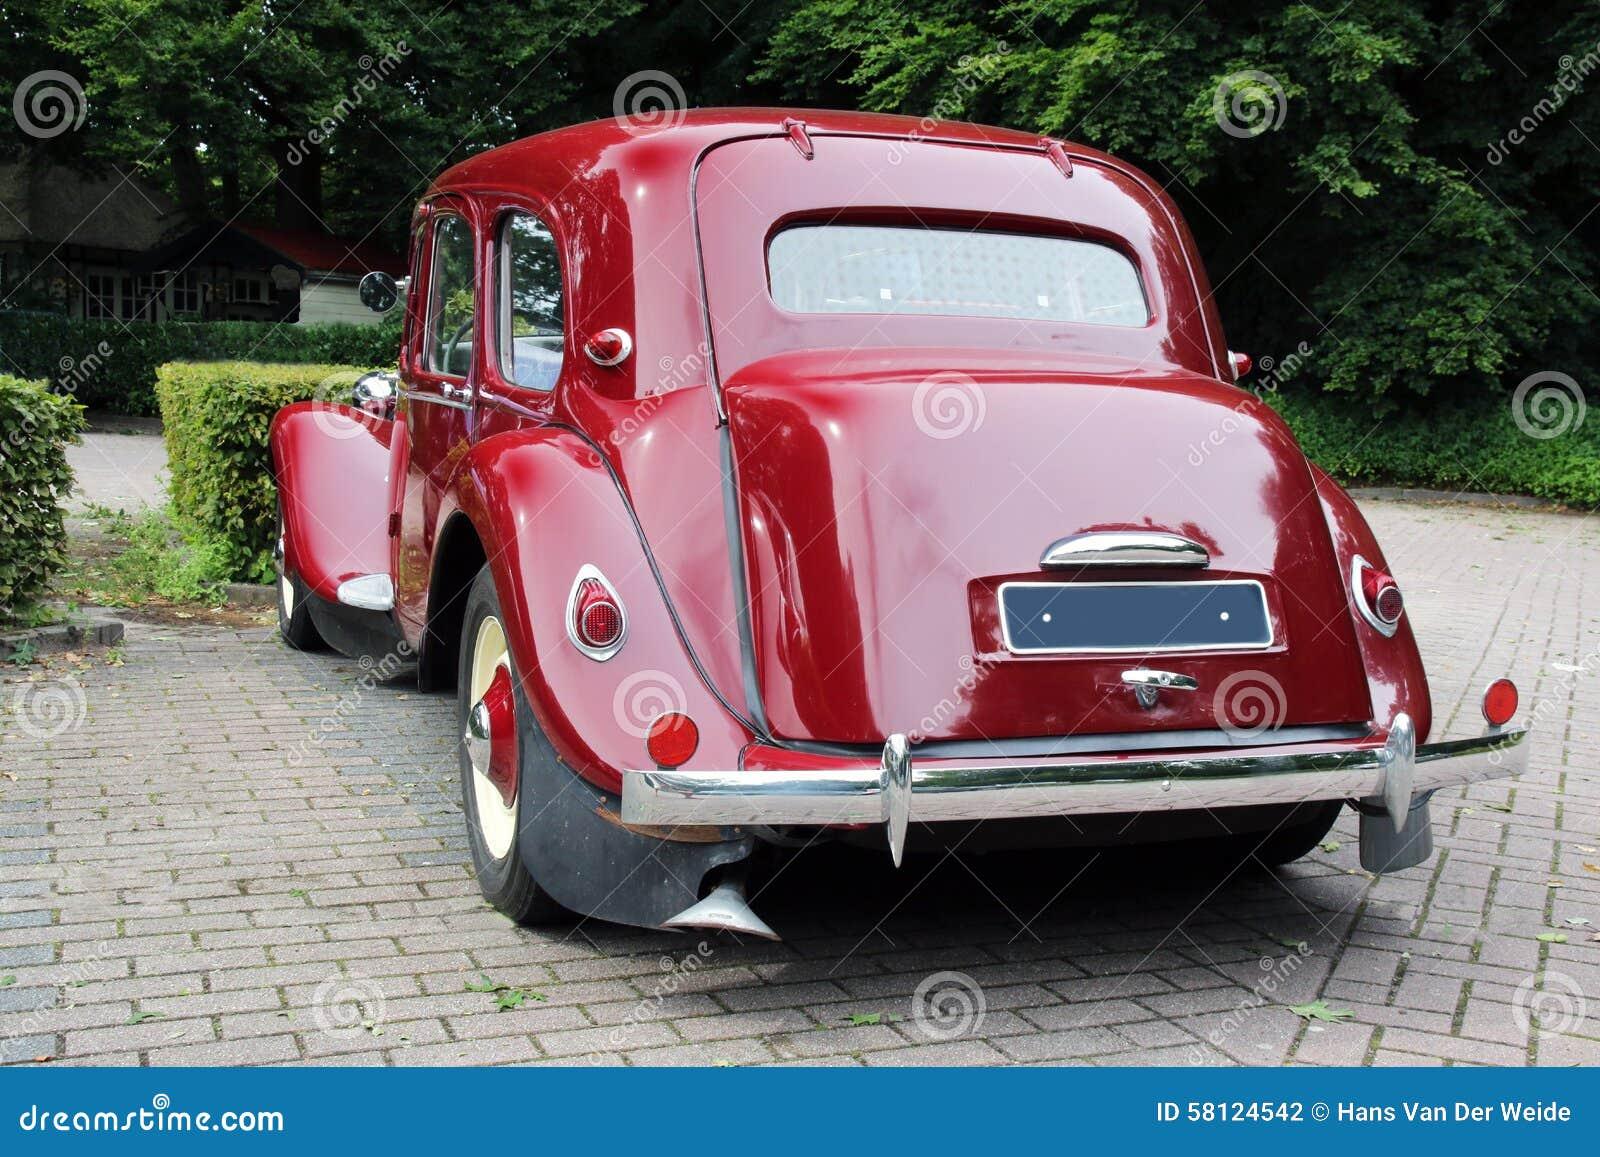 classic car citroen stock photo image 58124542. Black Bedroom Furniture Sets. Home Design Ideas